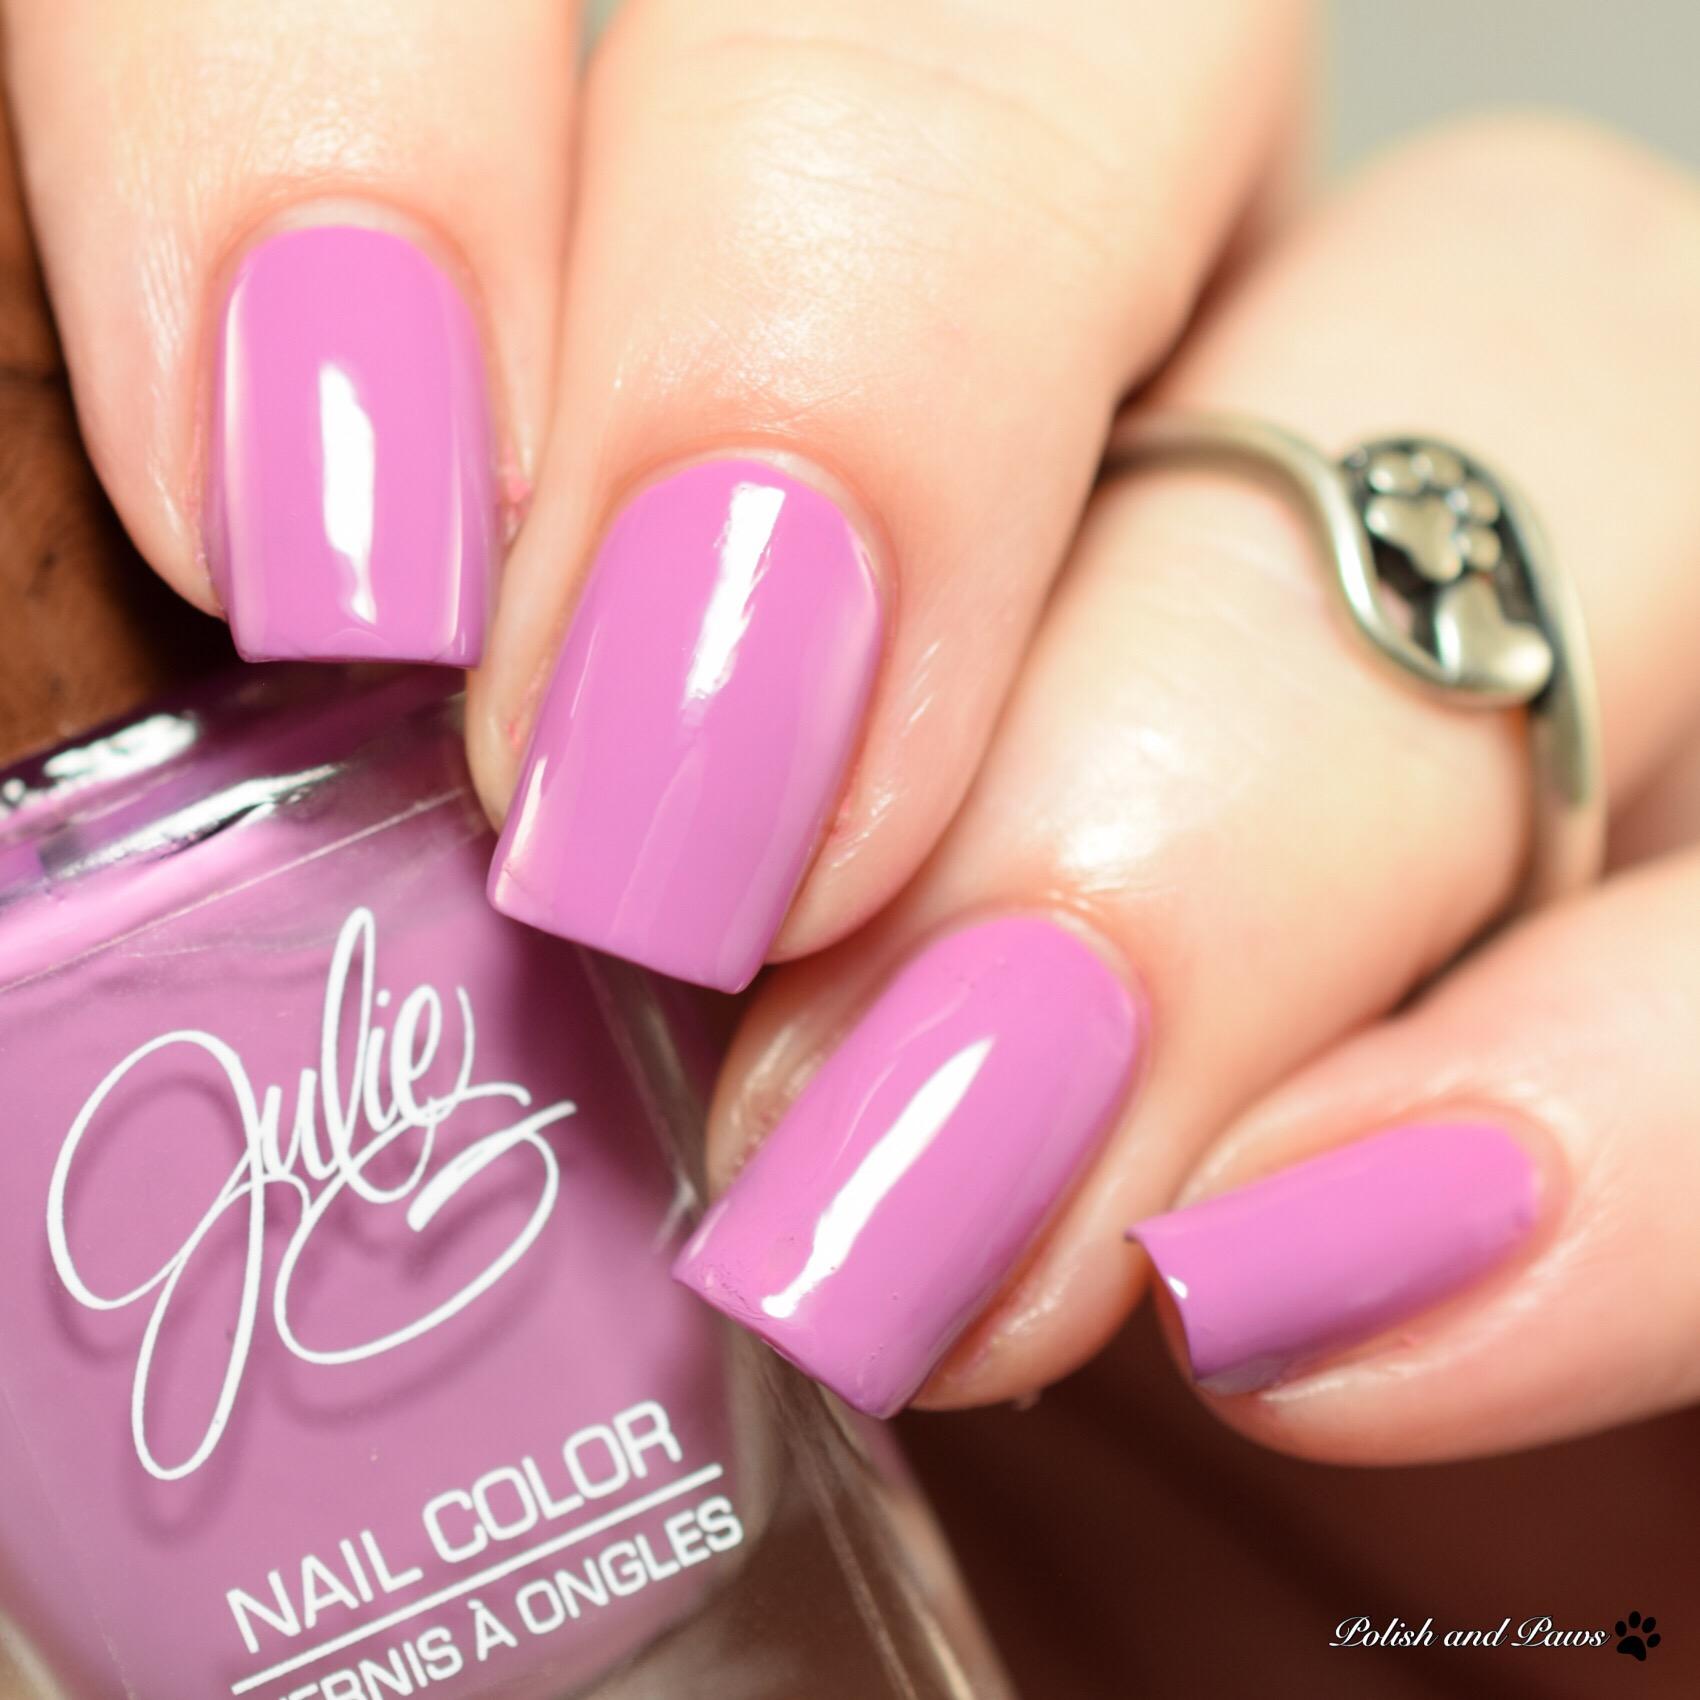 JulieG Harmony